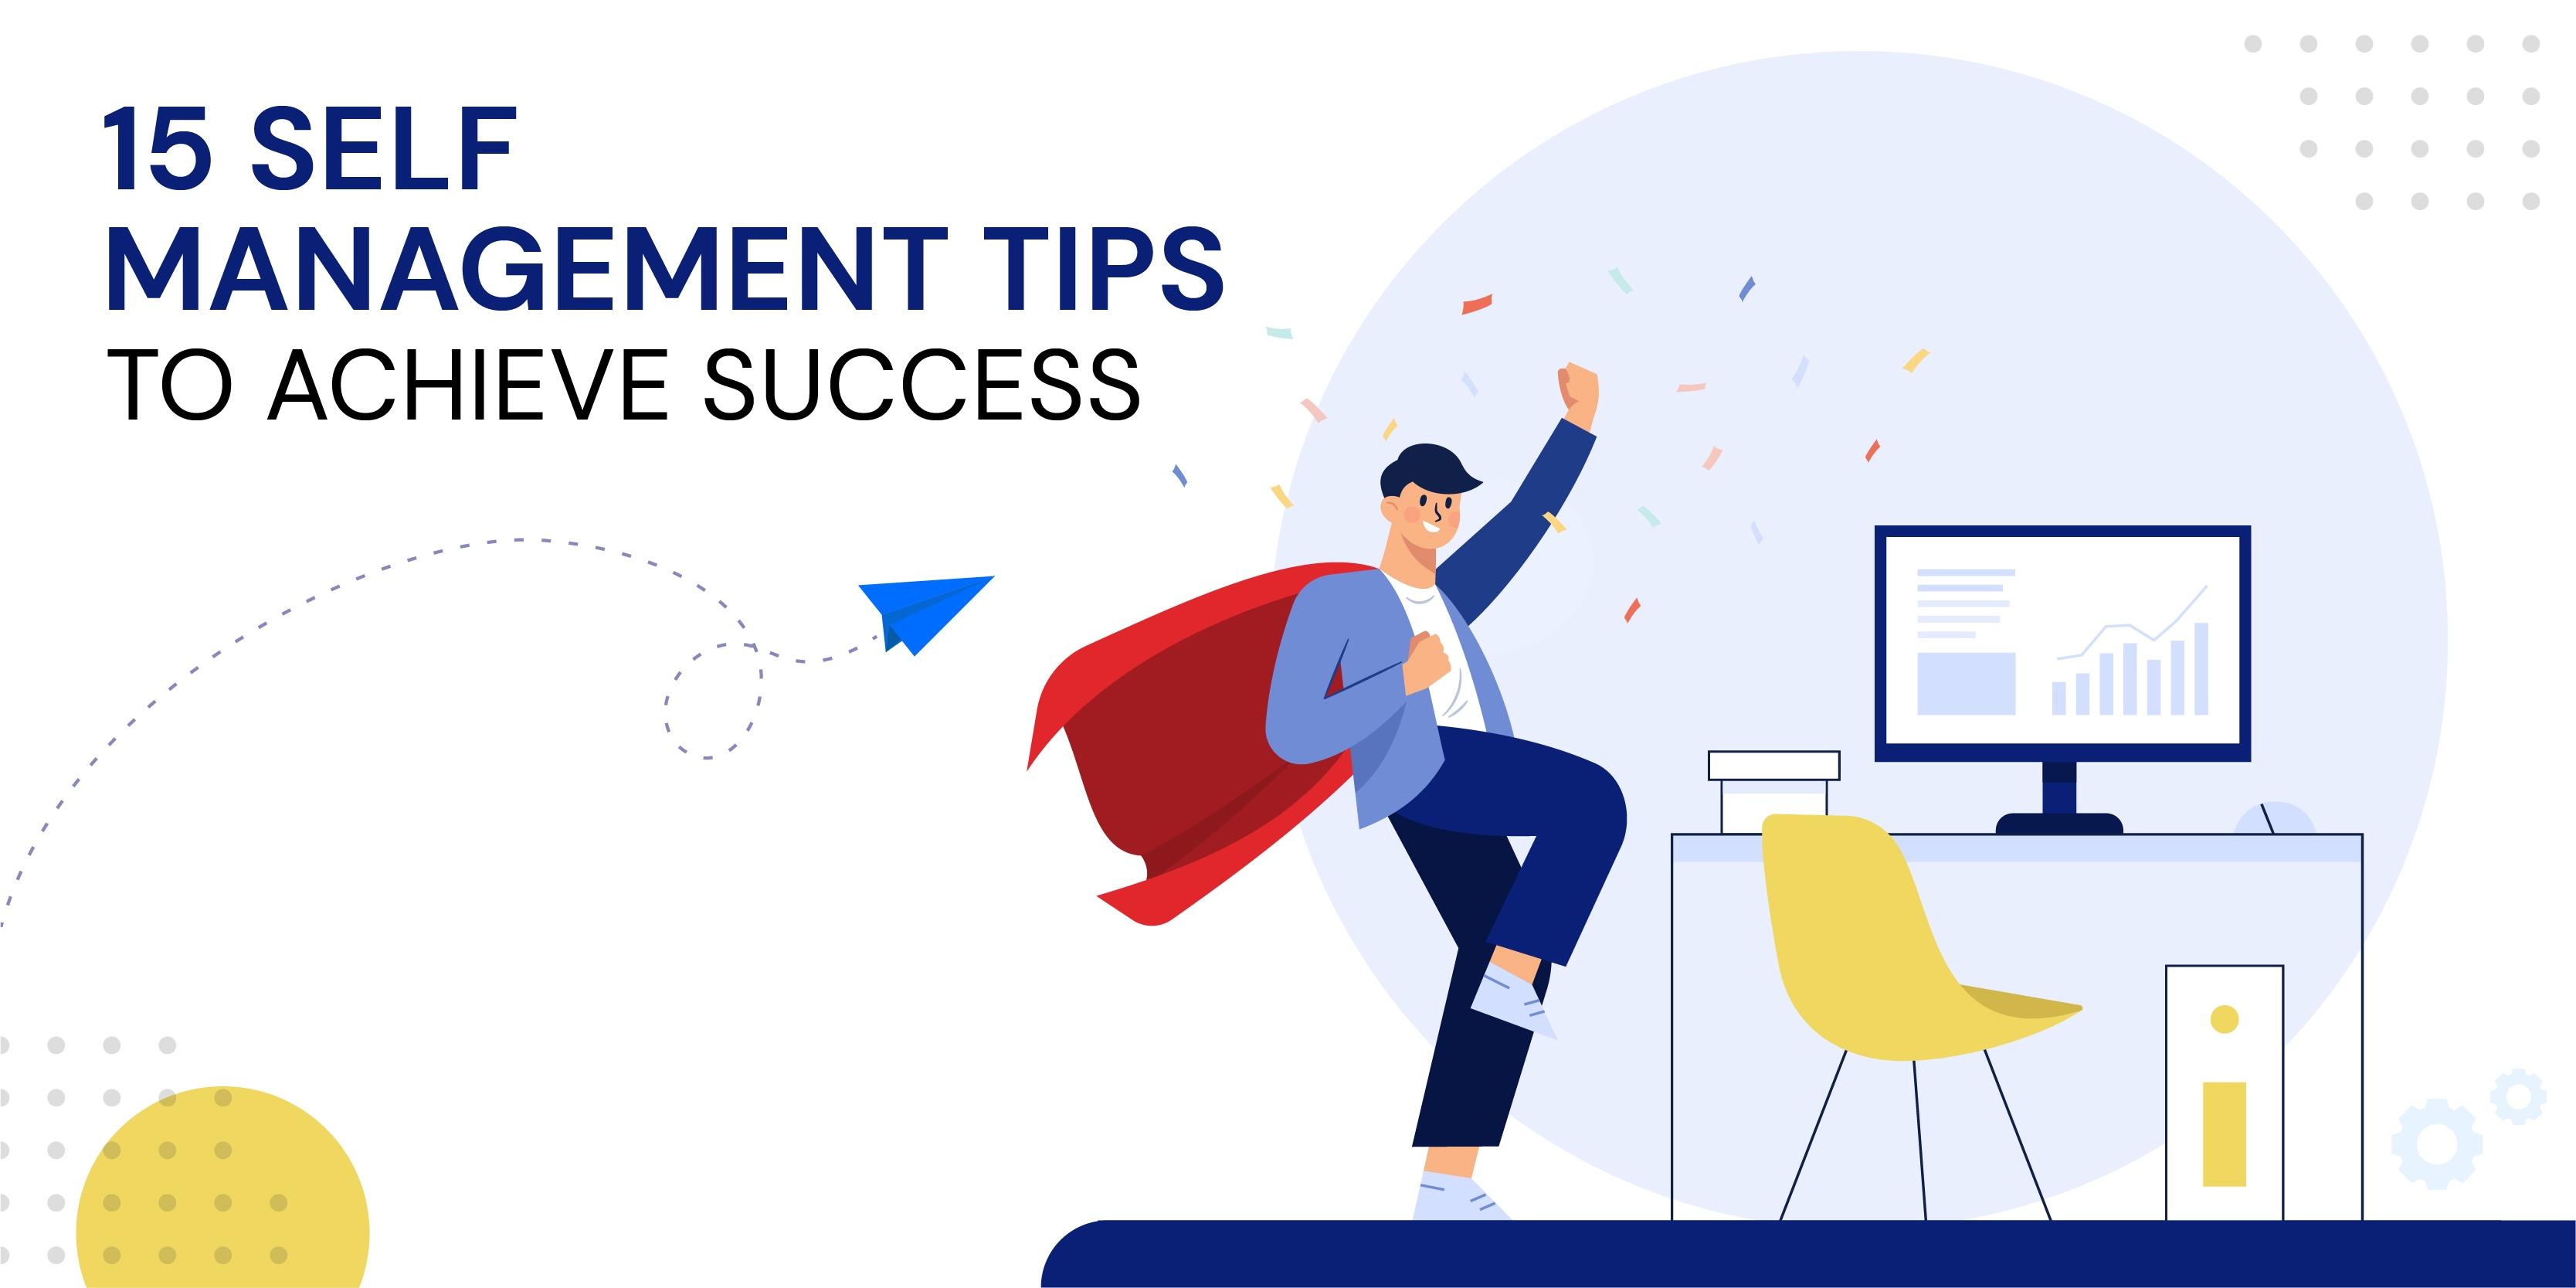 self-management tips